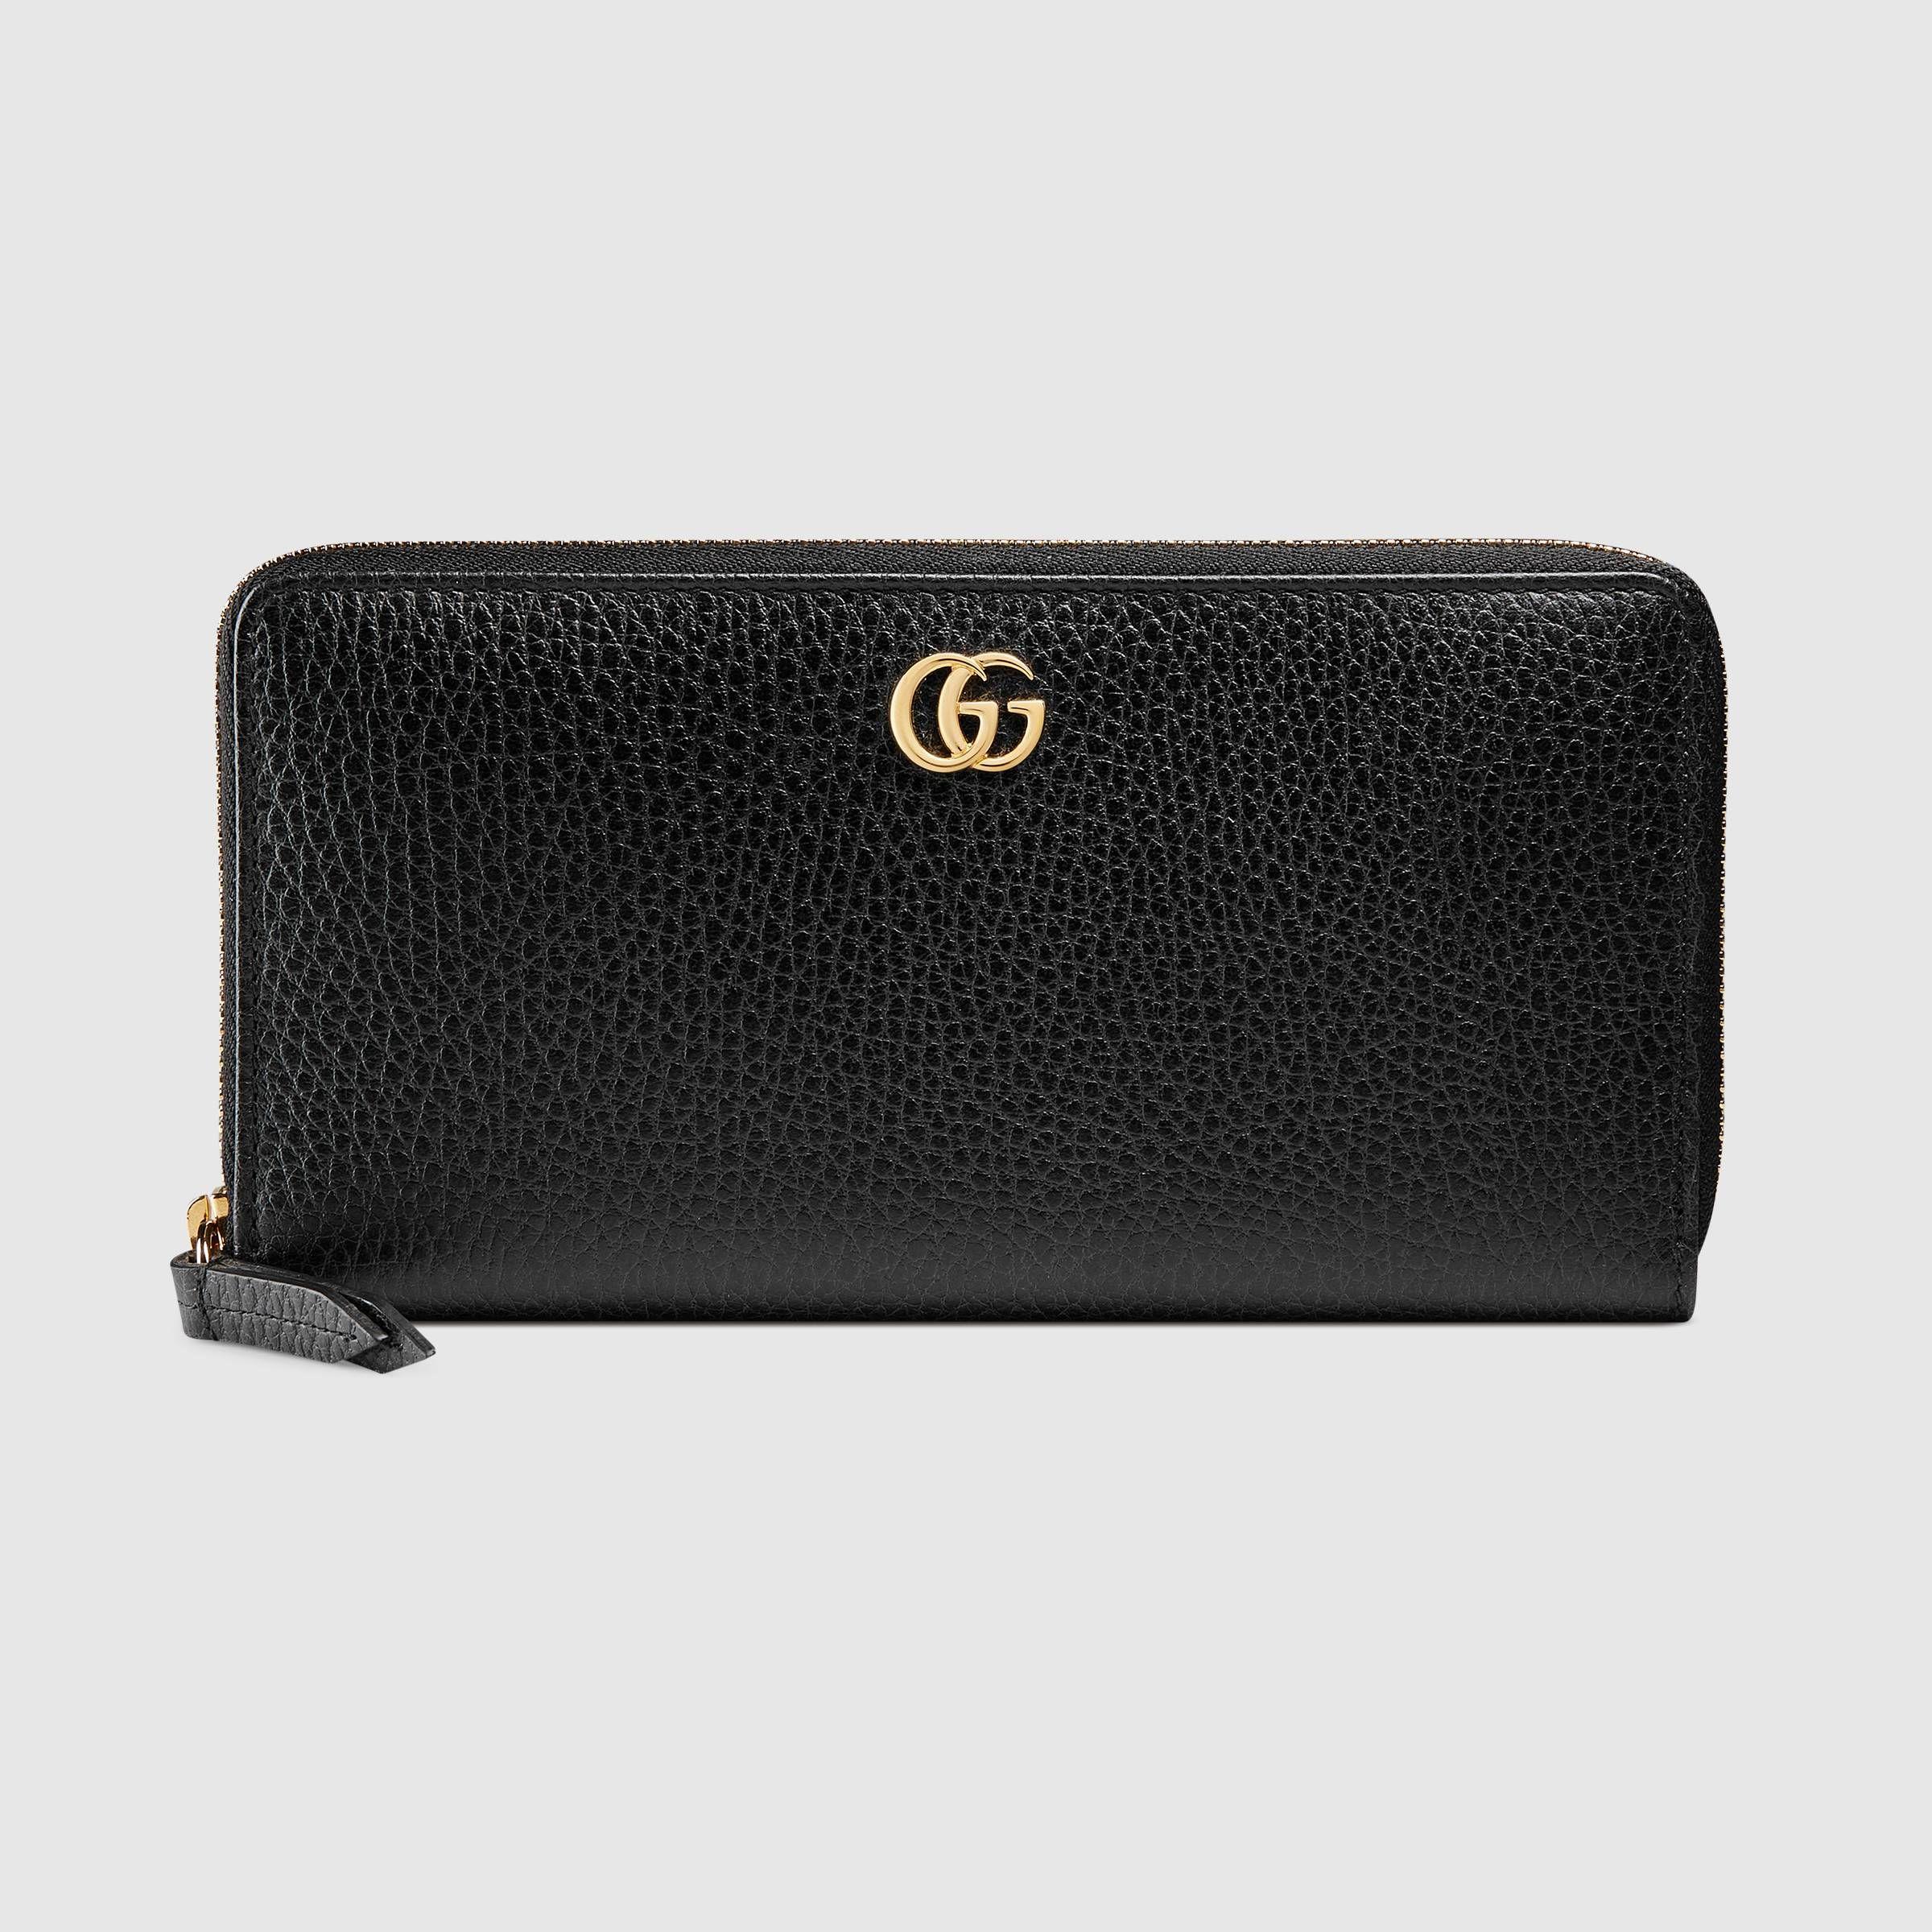 c9df6cbd0157e9 Leather zip around wallet - Gucci Women's Wallets & Small Accessories  456117CAO0G1000